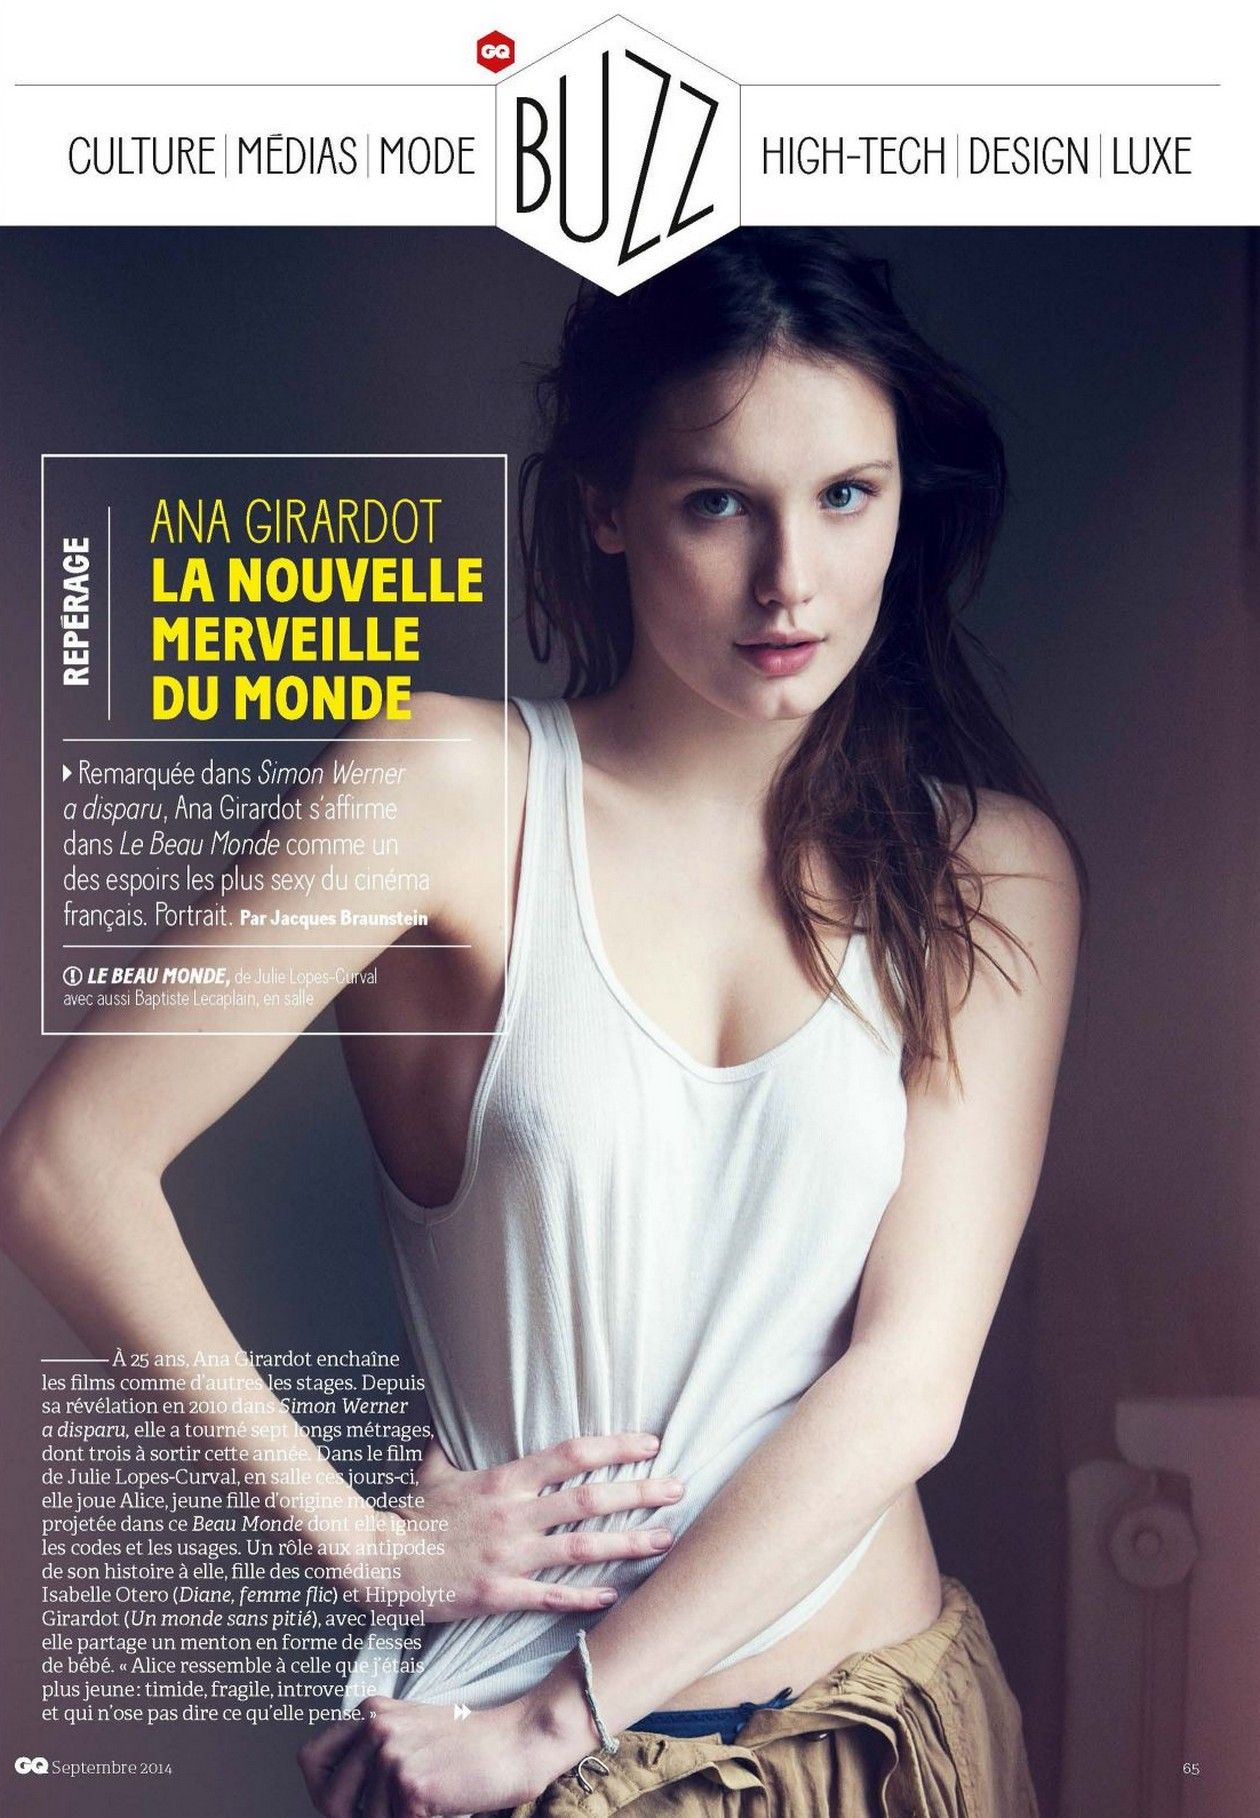 ANA GIRARDOT La nouvelle merveille du monde / GQ Magazine, France September 2014